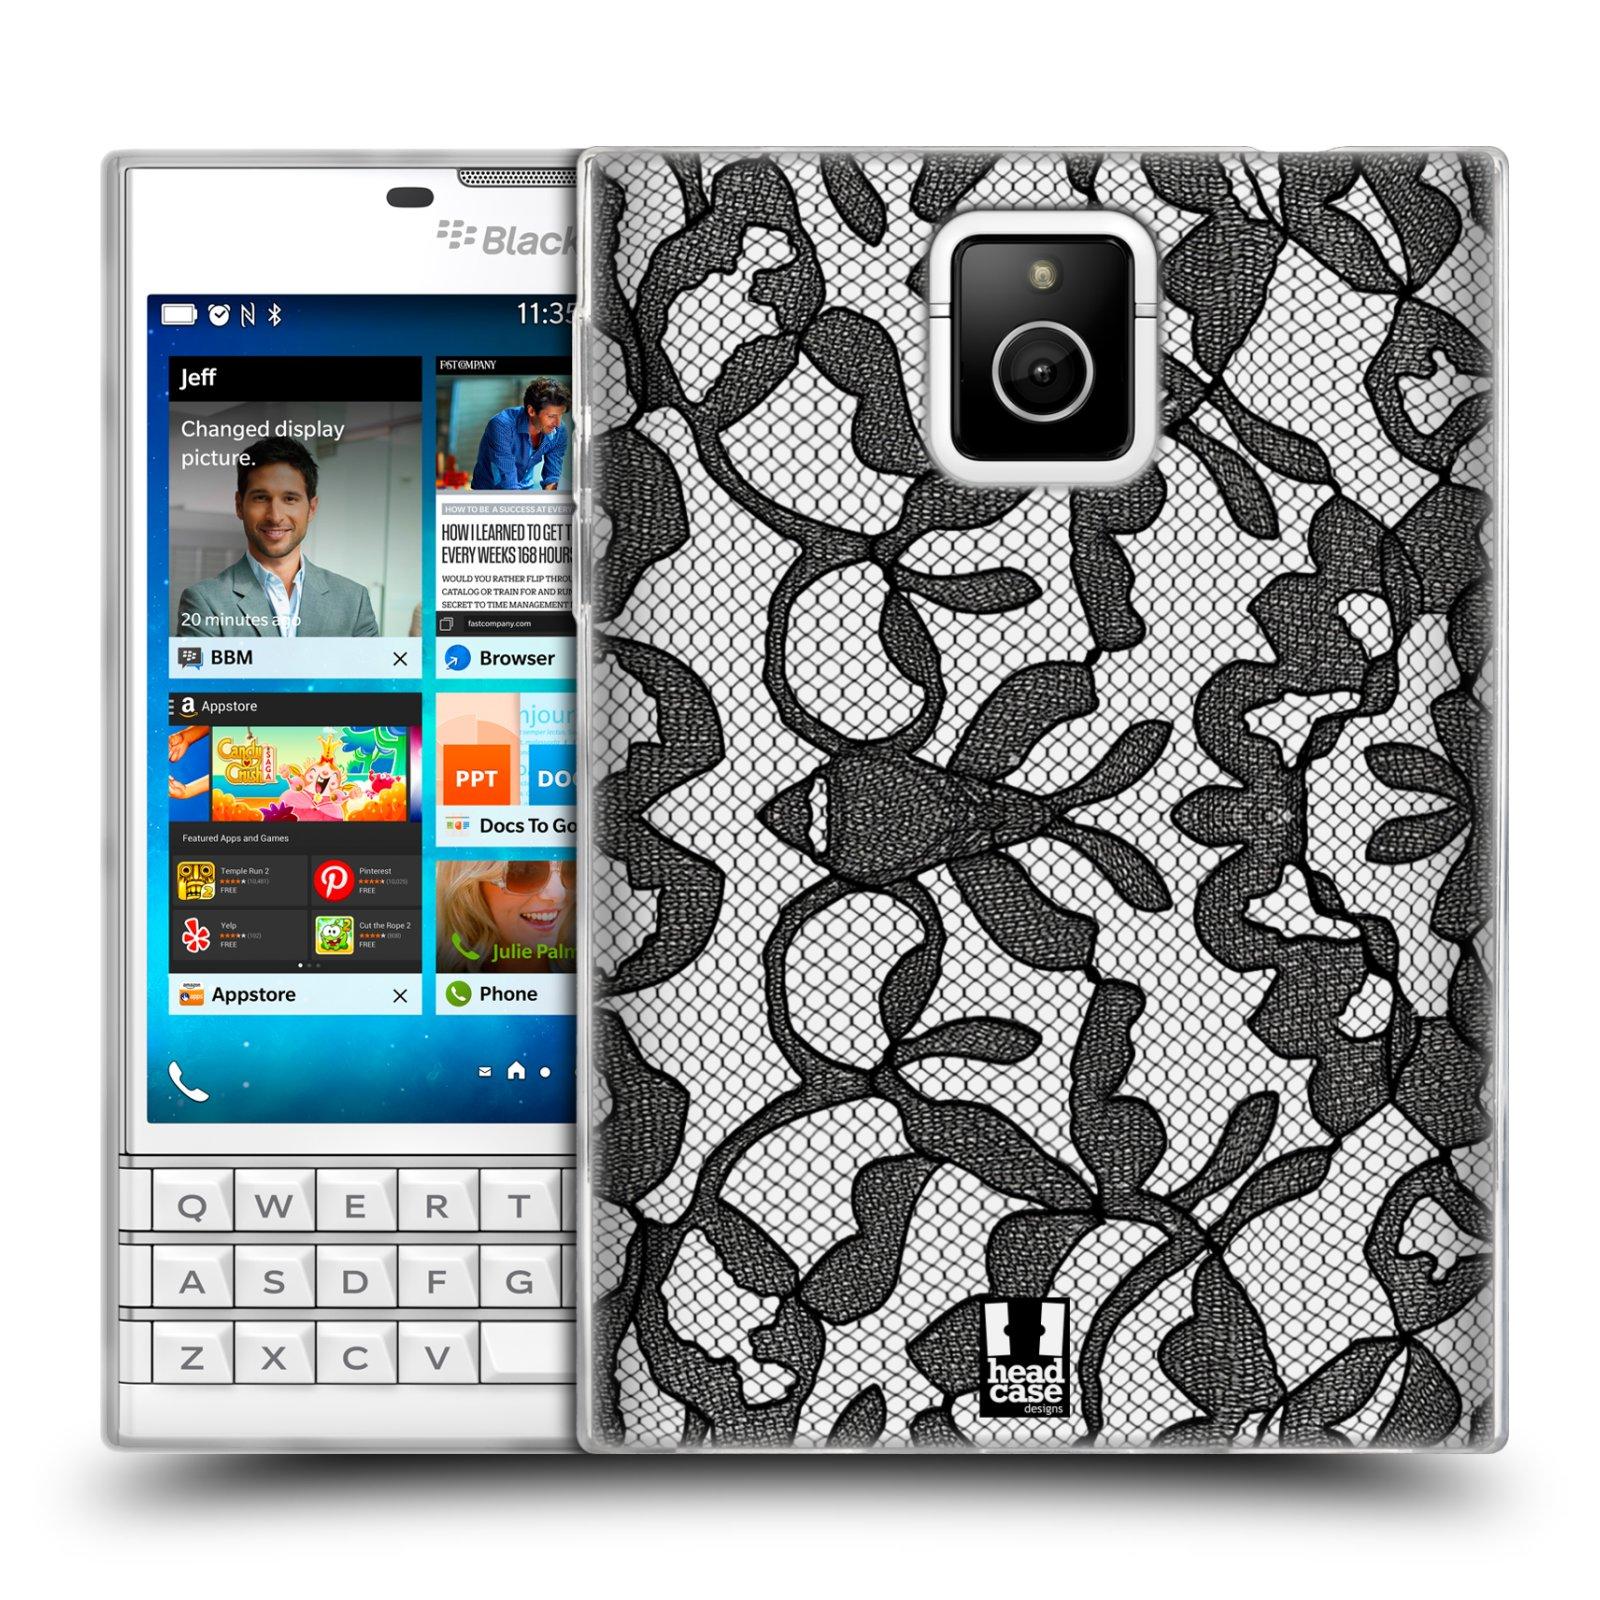 Silikonové pouzdro na mobil Blackberry PASSPORT HEAD CASE LEAFY KRAJKA (Silikonový kryt či obal na mobilní telefon Blackberry PASSPORT)